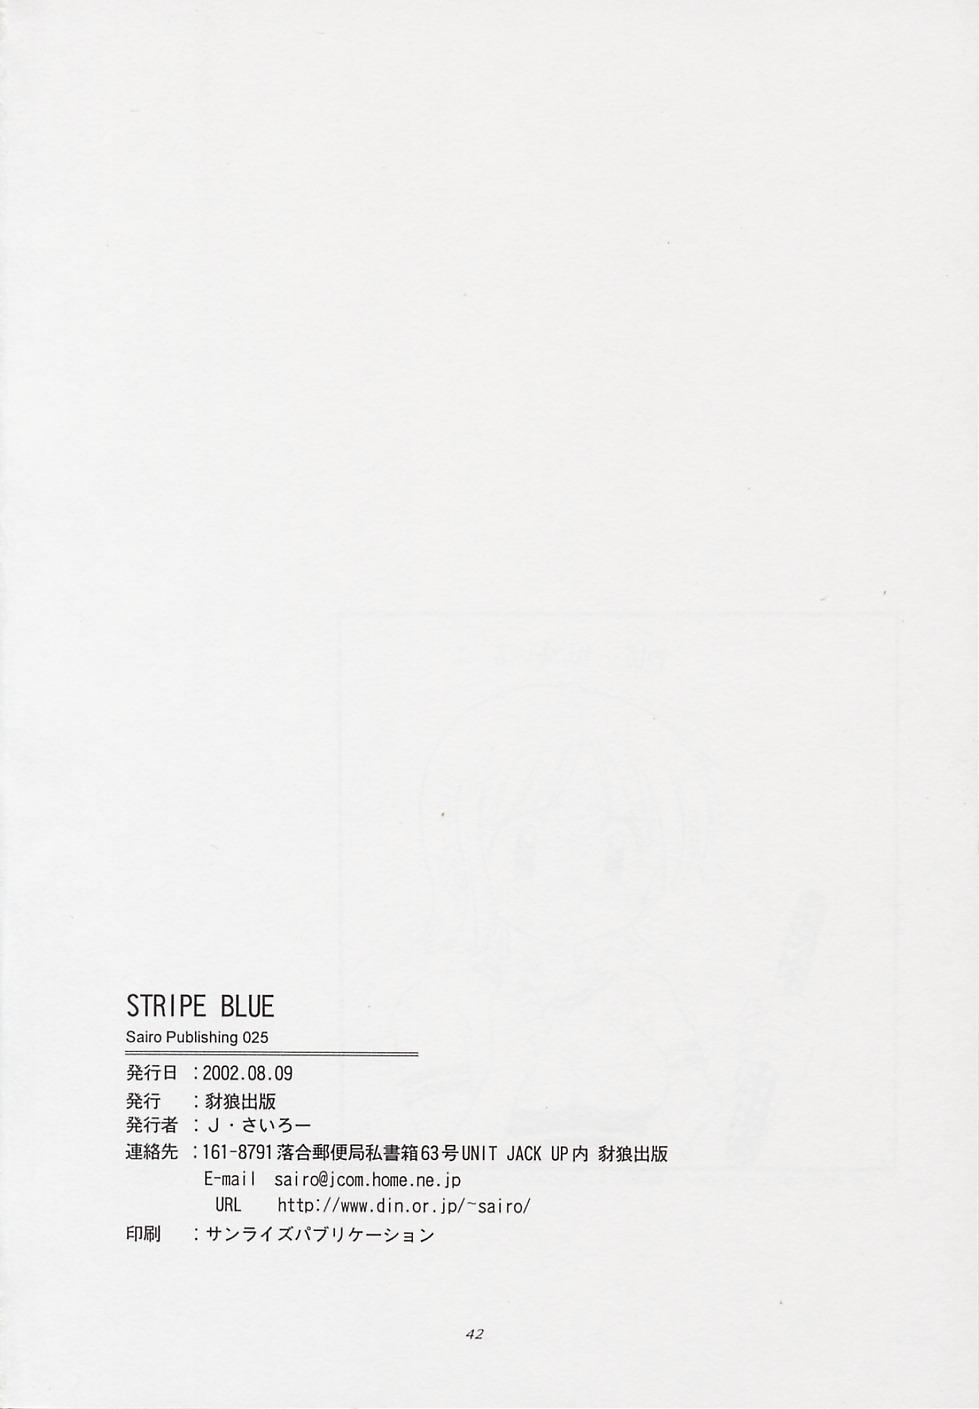 STRIPE BLUE 39